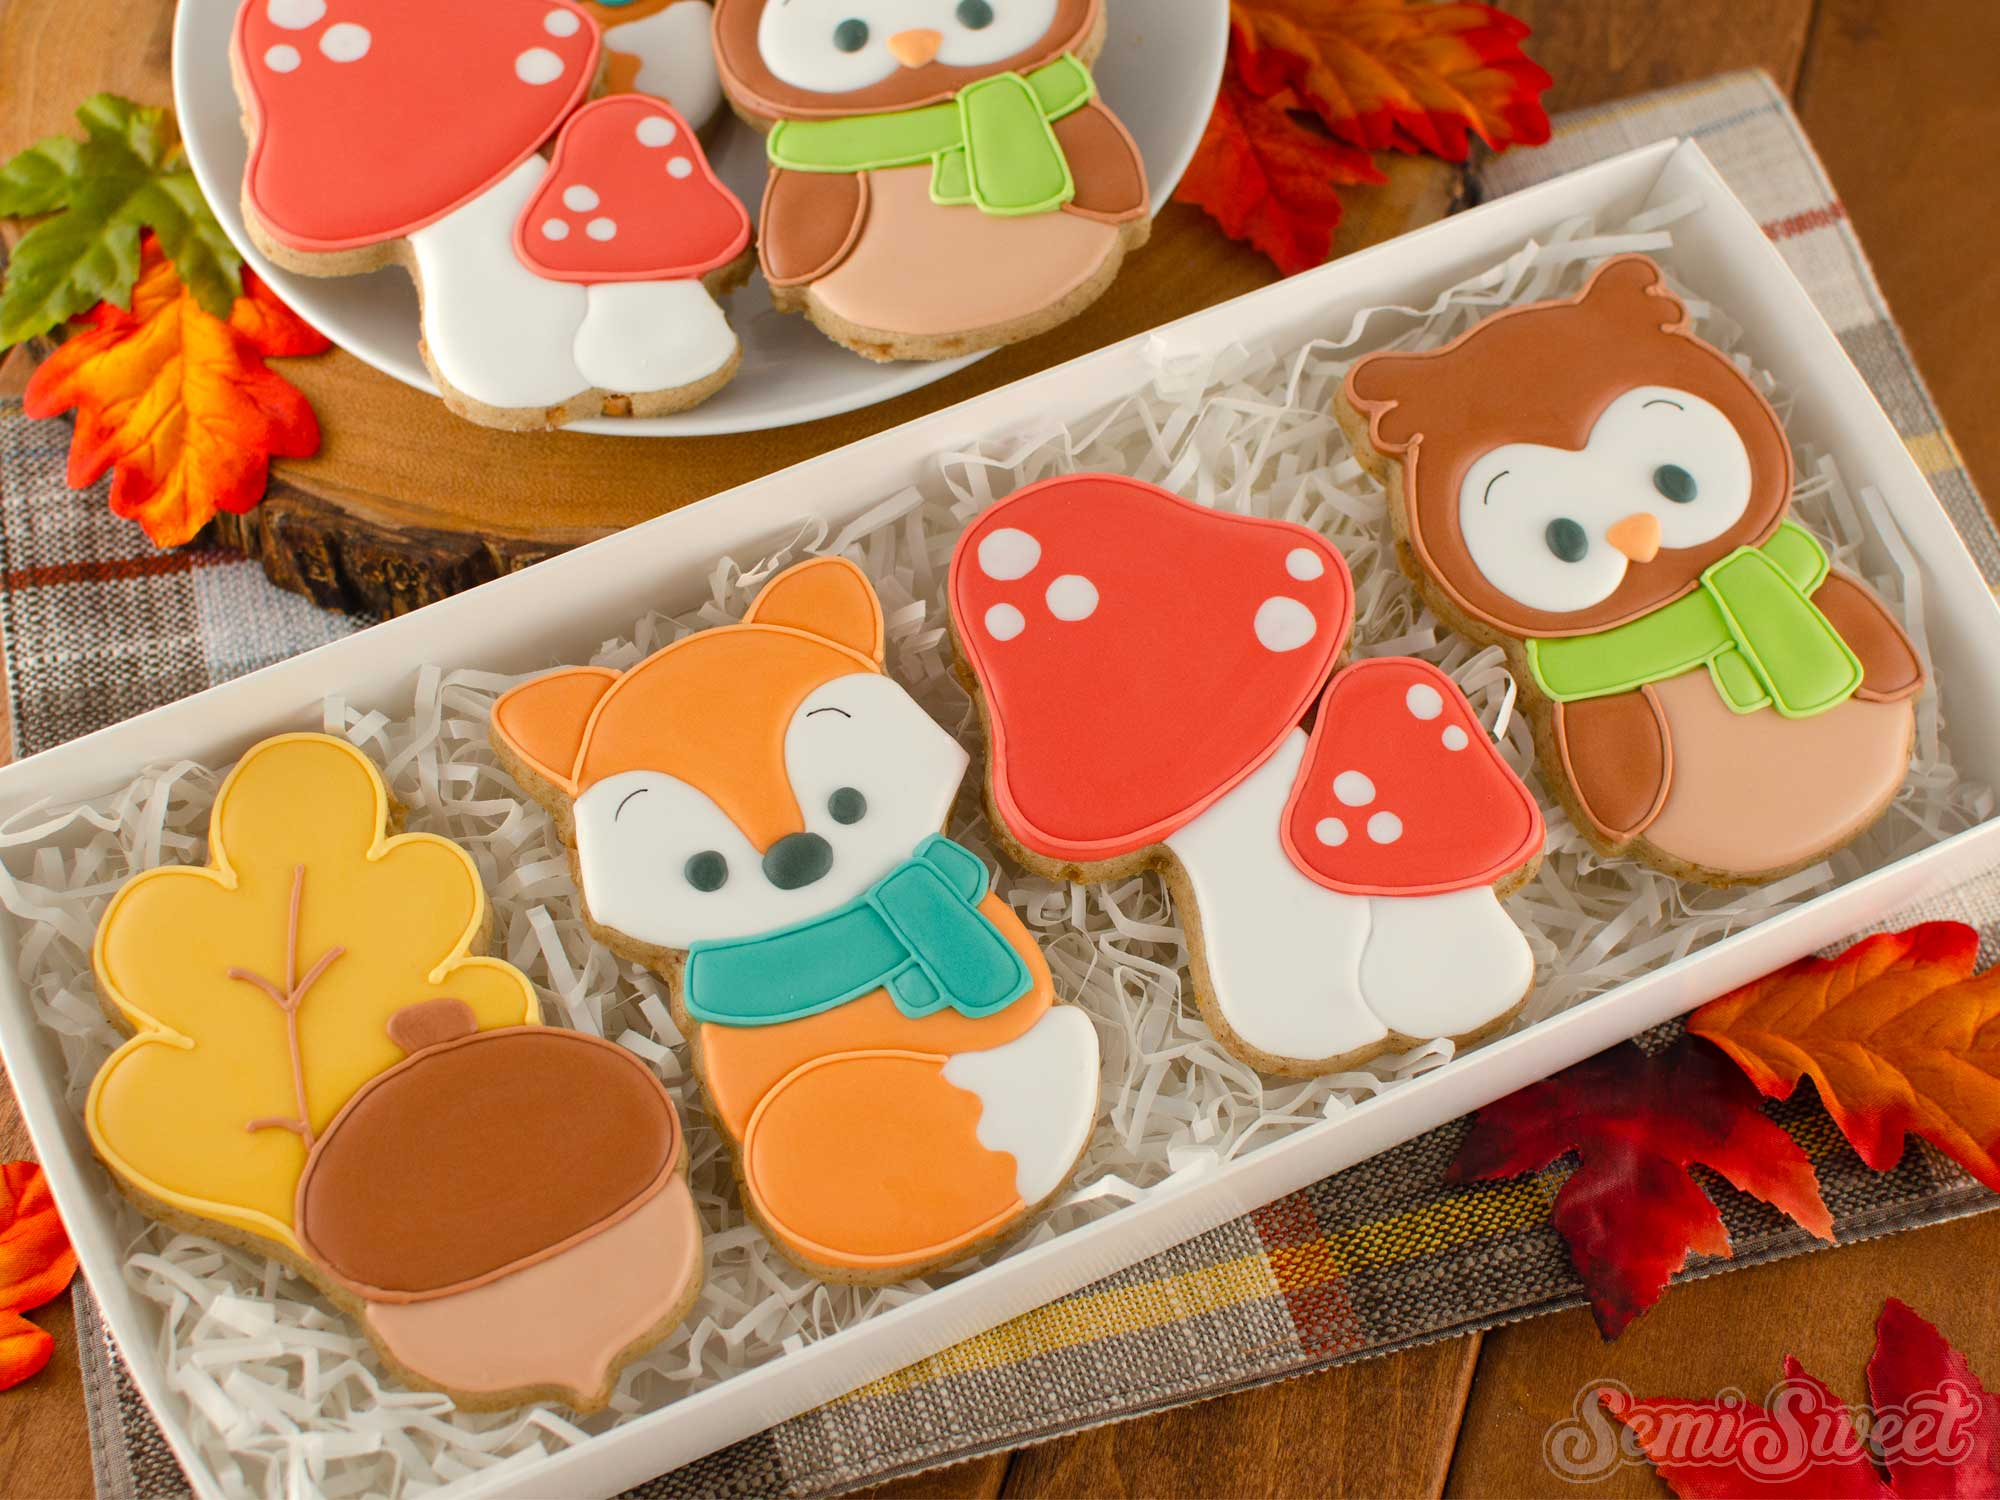 autumn woodland cookies in a box | Semi Sweet Designs